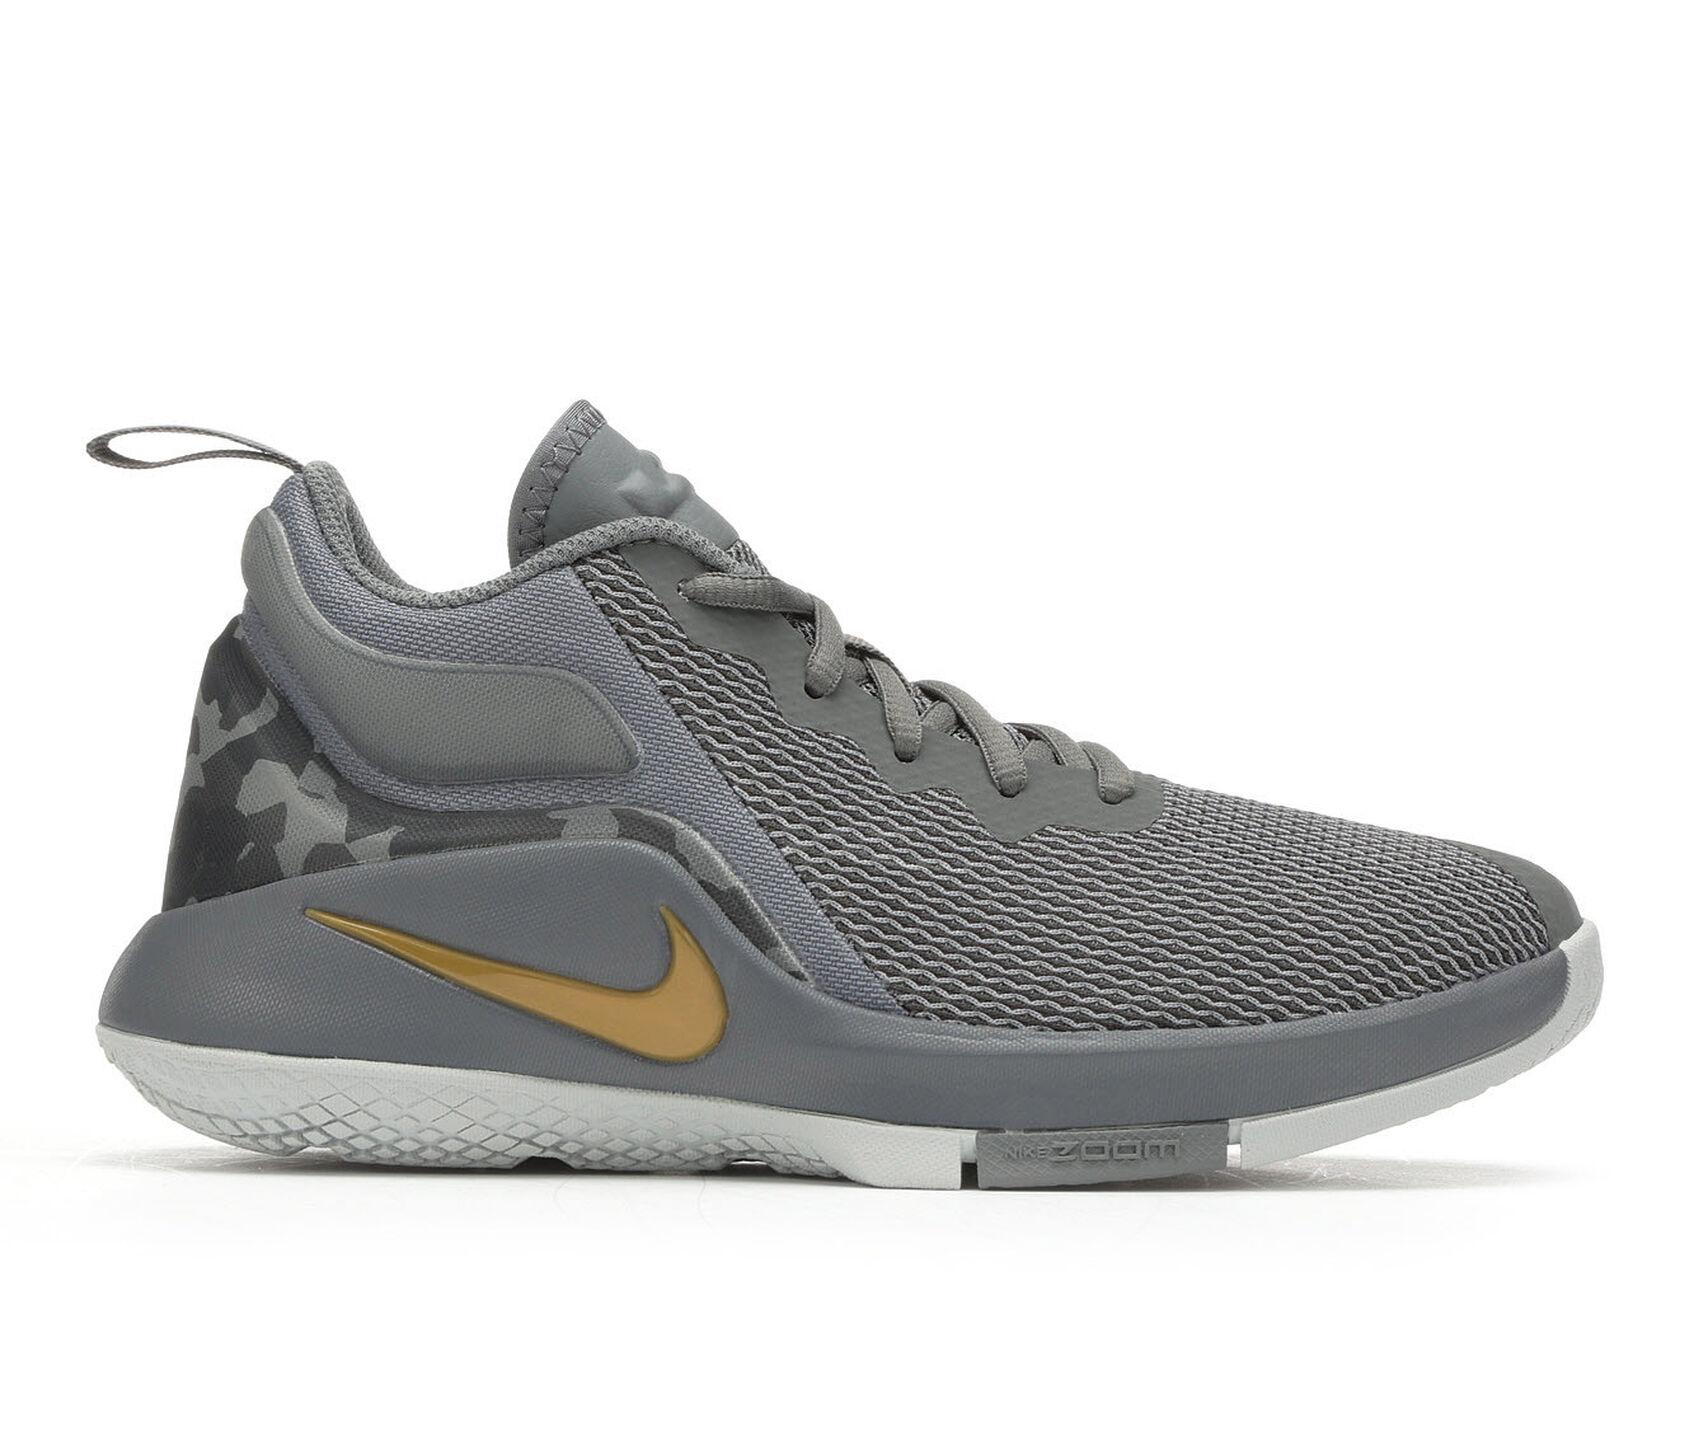 e6c1360cb253 ... RedAnthraciteWhite Boys Nike Lebron Witness II 3.5-7 Basketball Shoes  ...